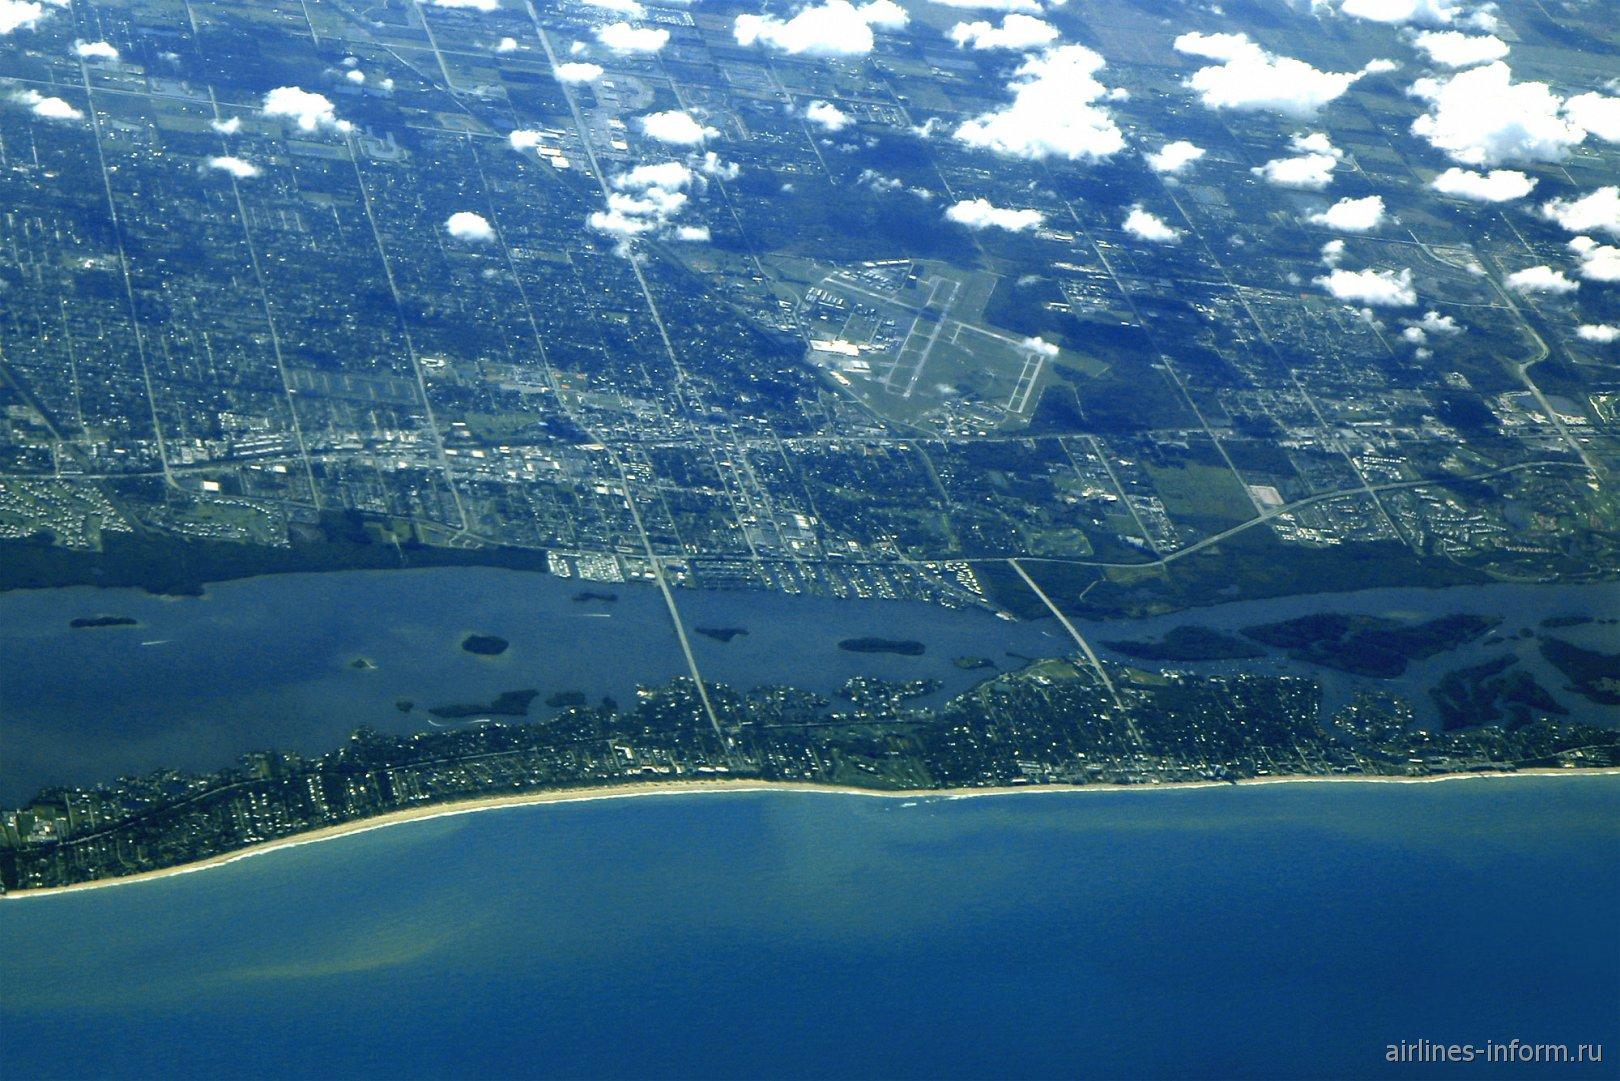 Городок Веро-Бич (Vero Beach), штат Флорида